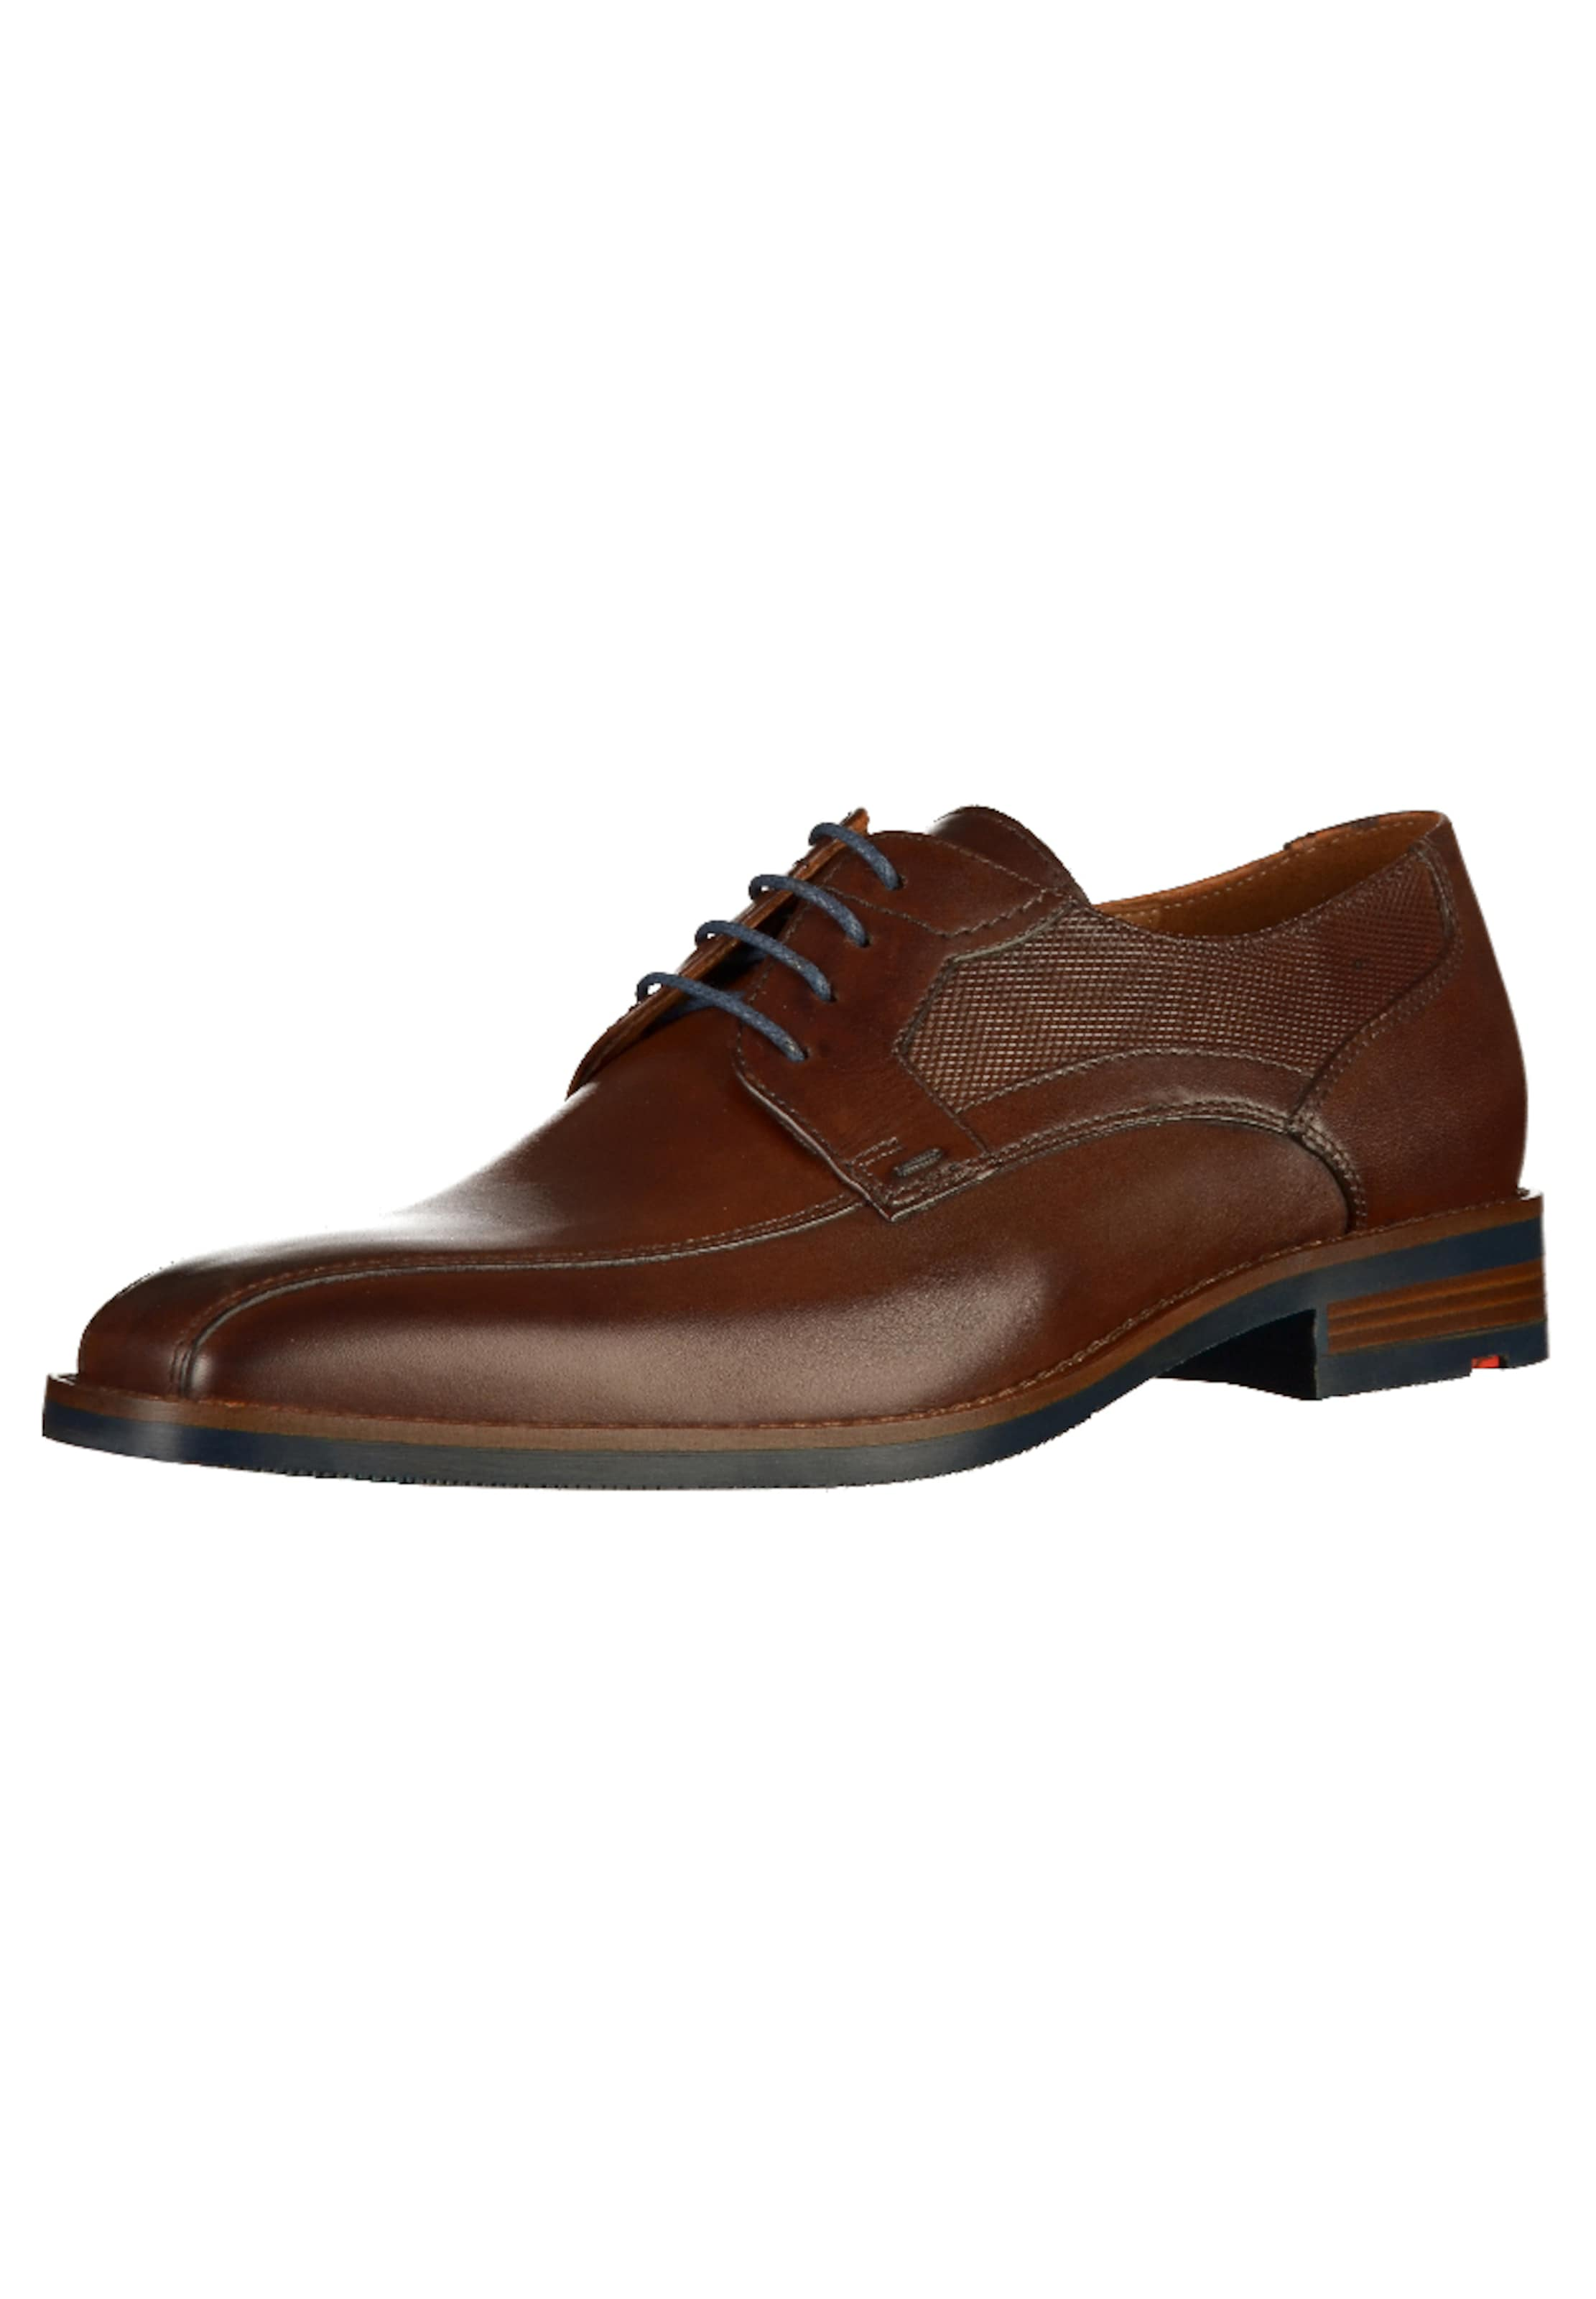 Haltbare Mode billige Schuhe LLOYD   Businessschuhe Schuhe Gut getragene getragene getragene Schuhe 584253